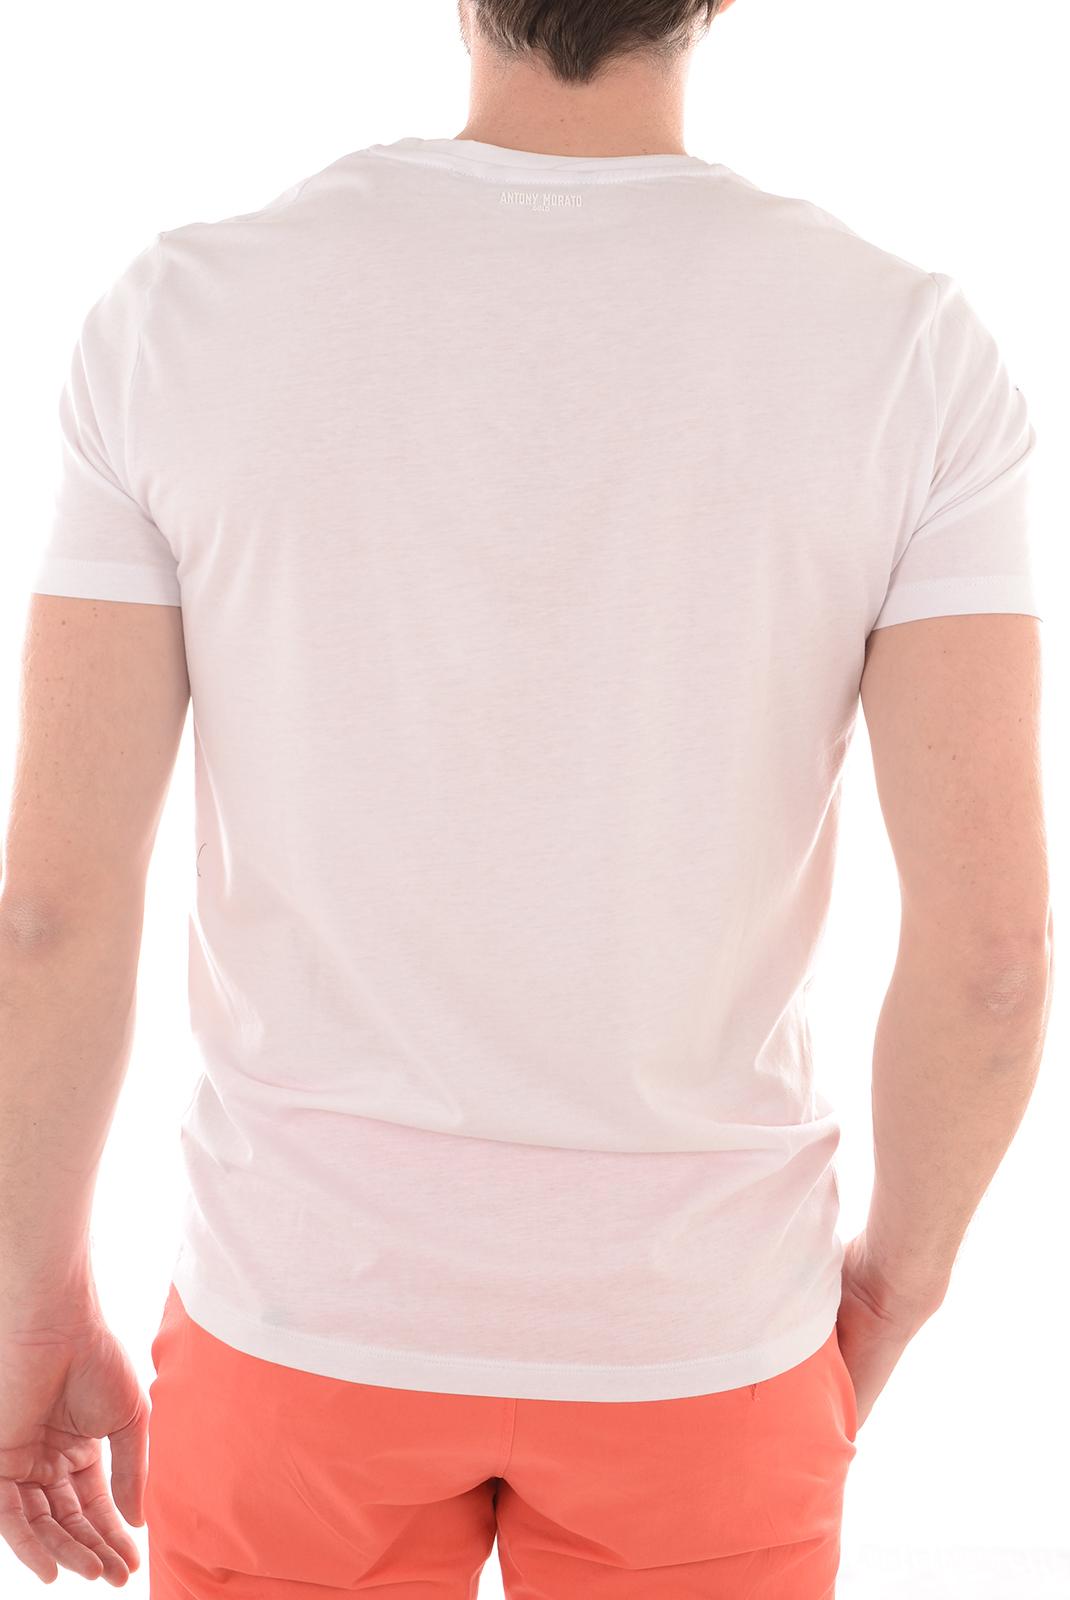 Tee-shirts  Antony morato MMKS00827 100 BLANC